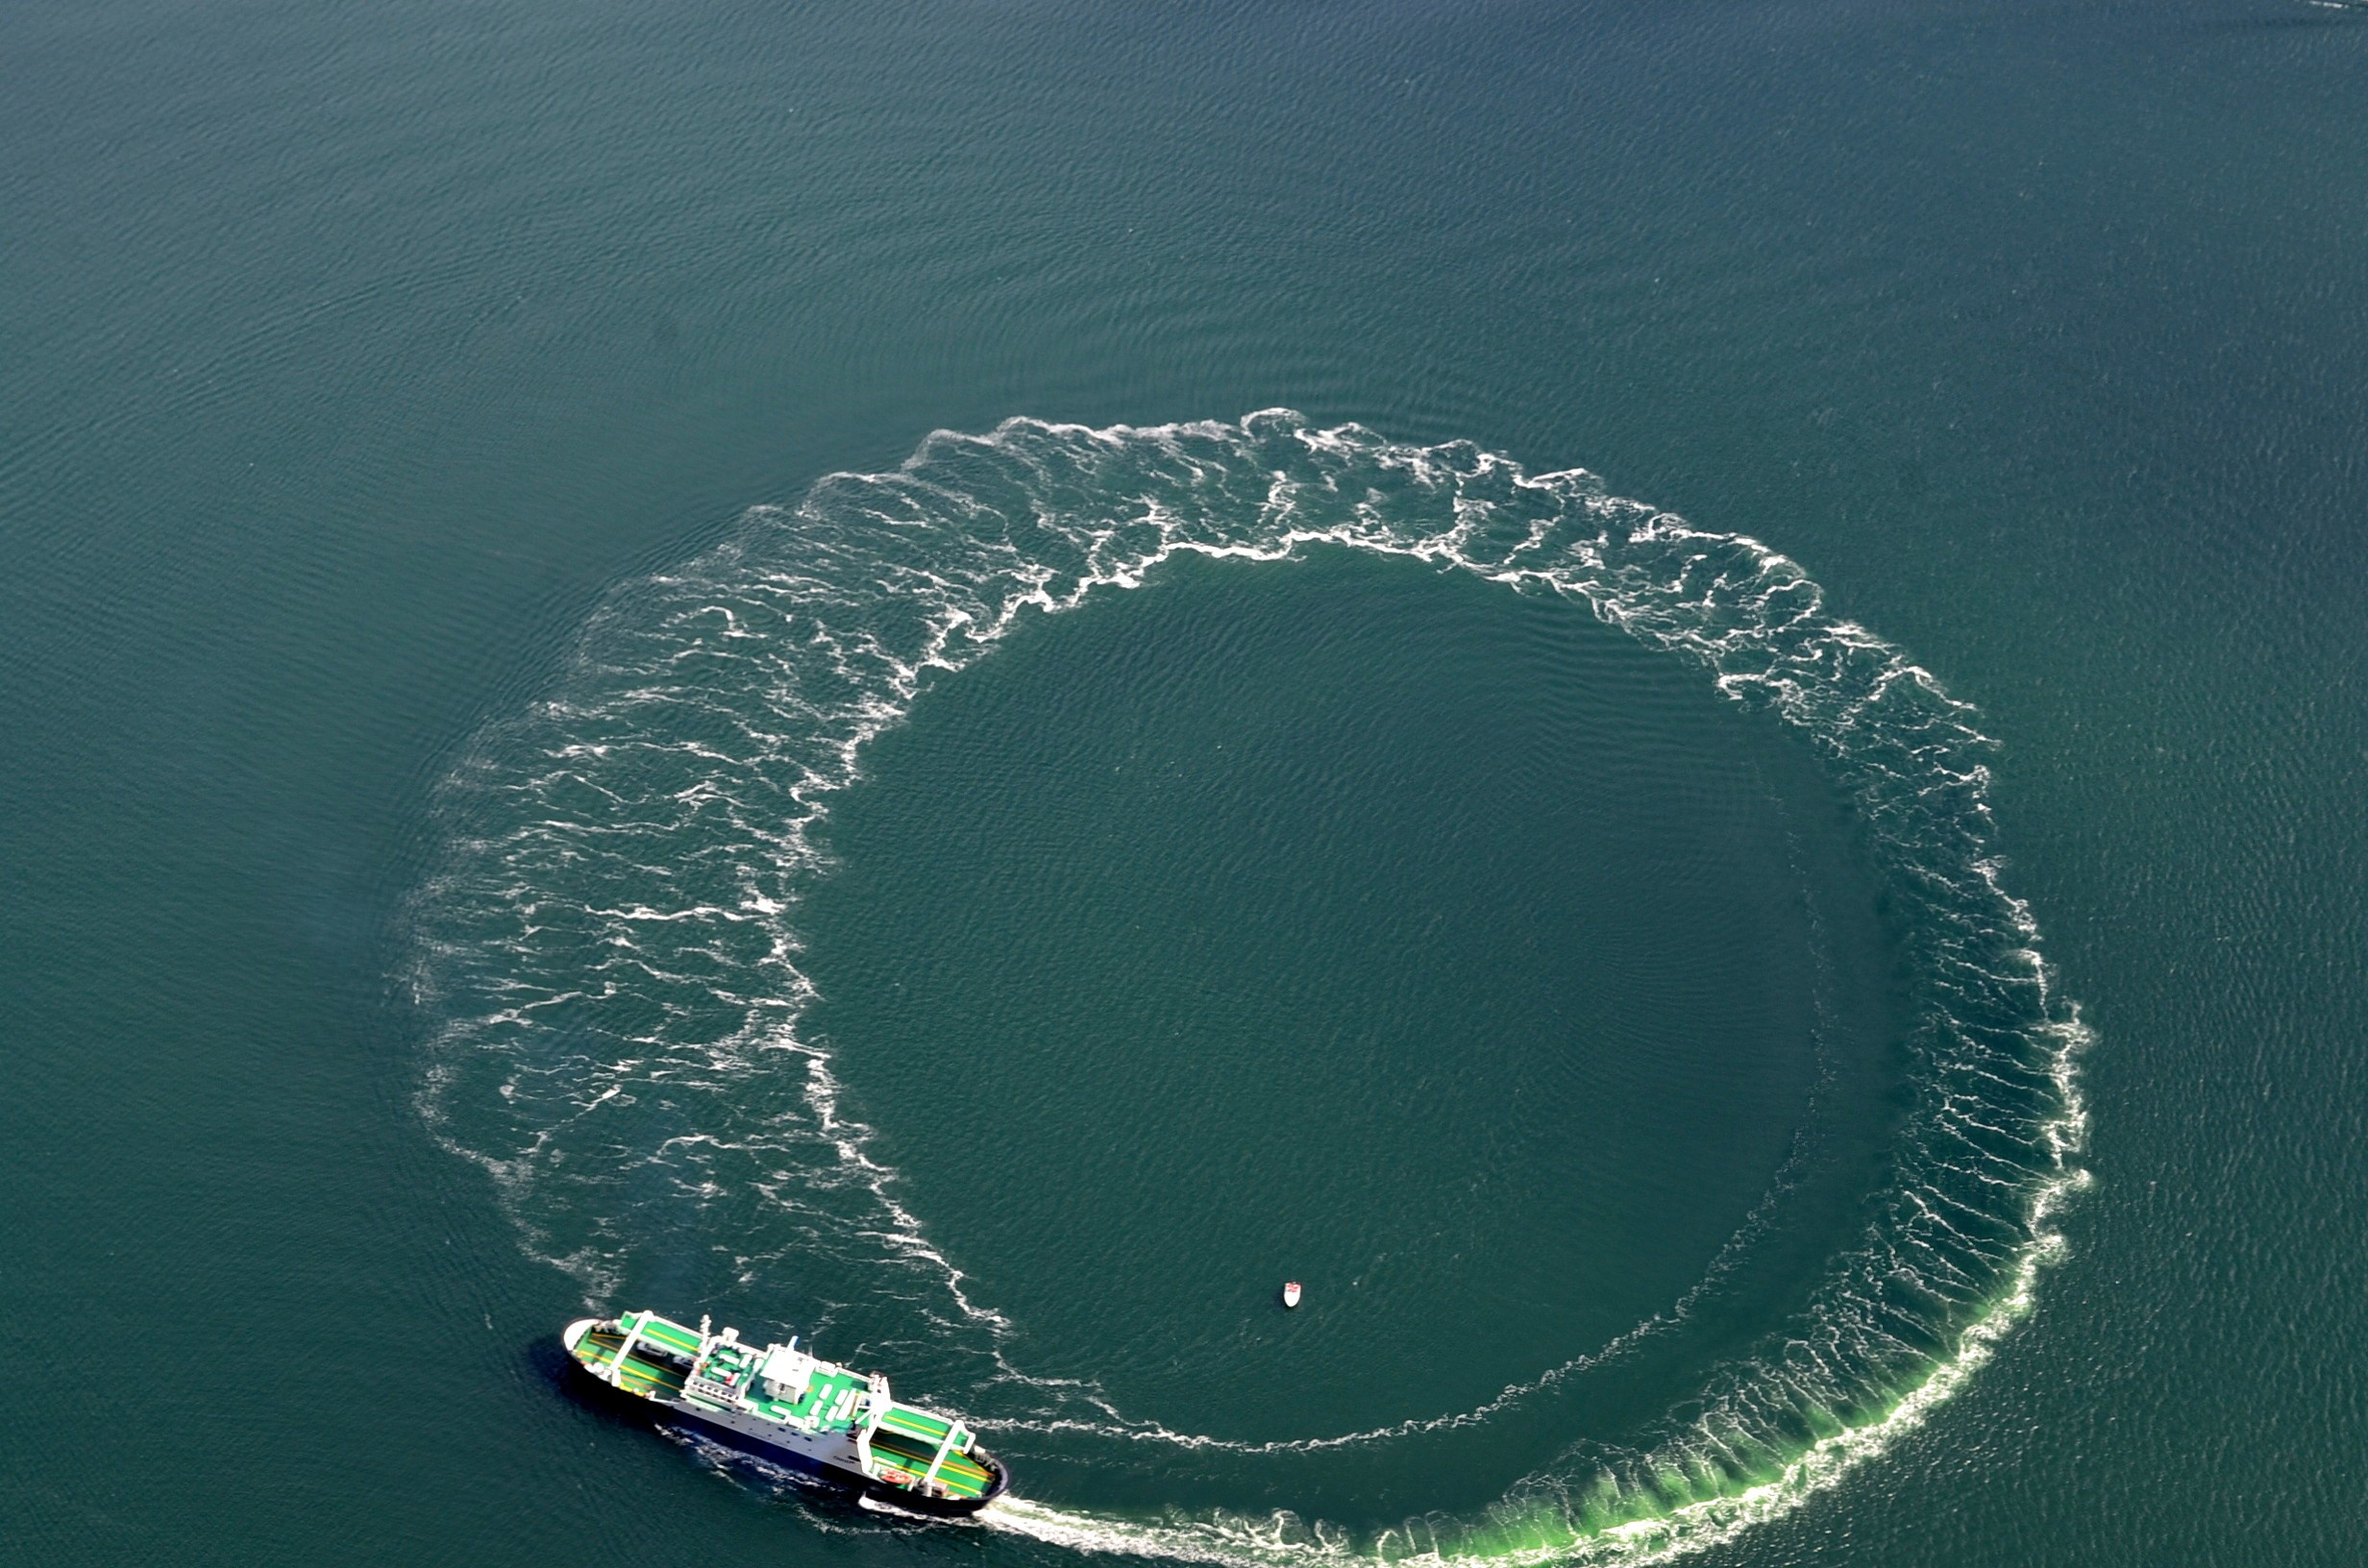 Cruise Ship doing a full 360 Preikestolen ( Pulpit rock)